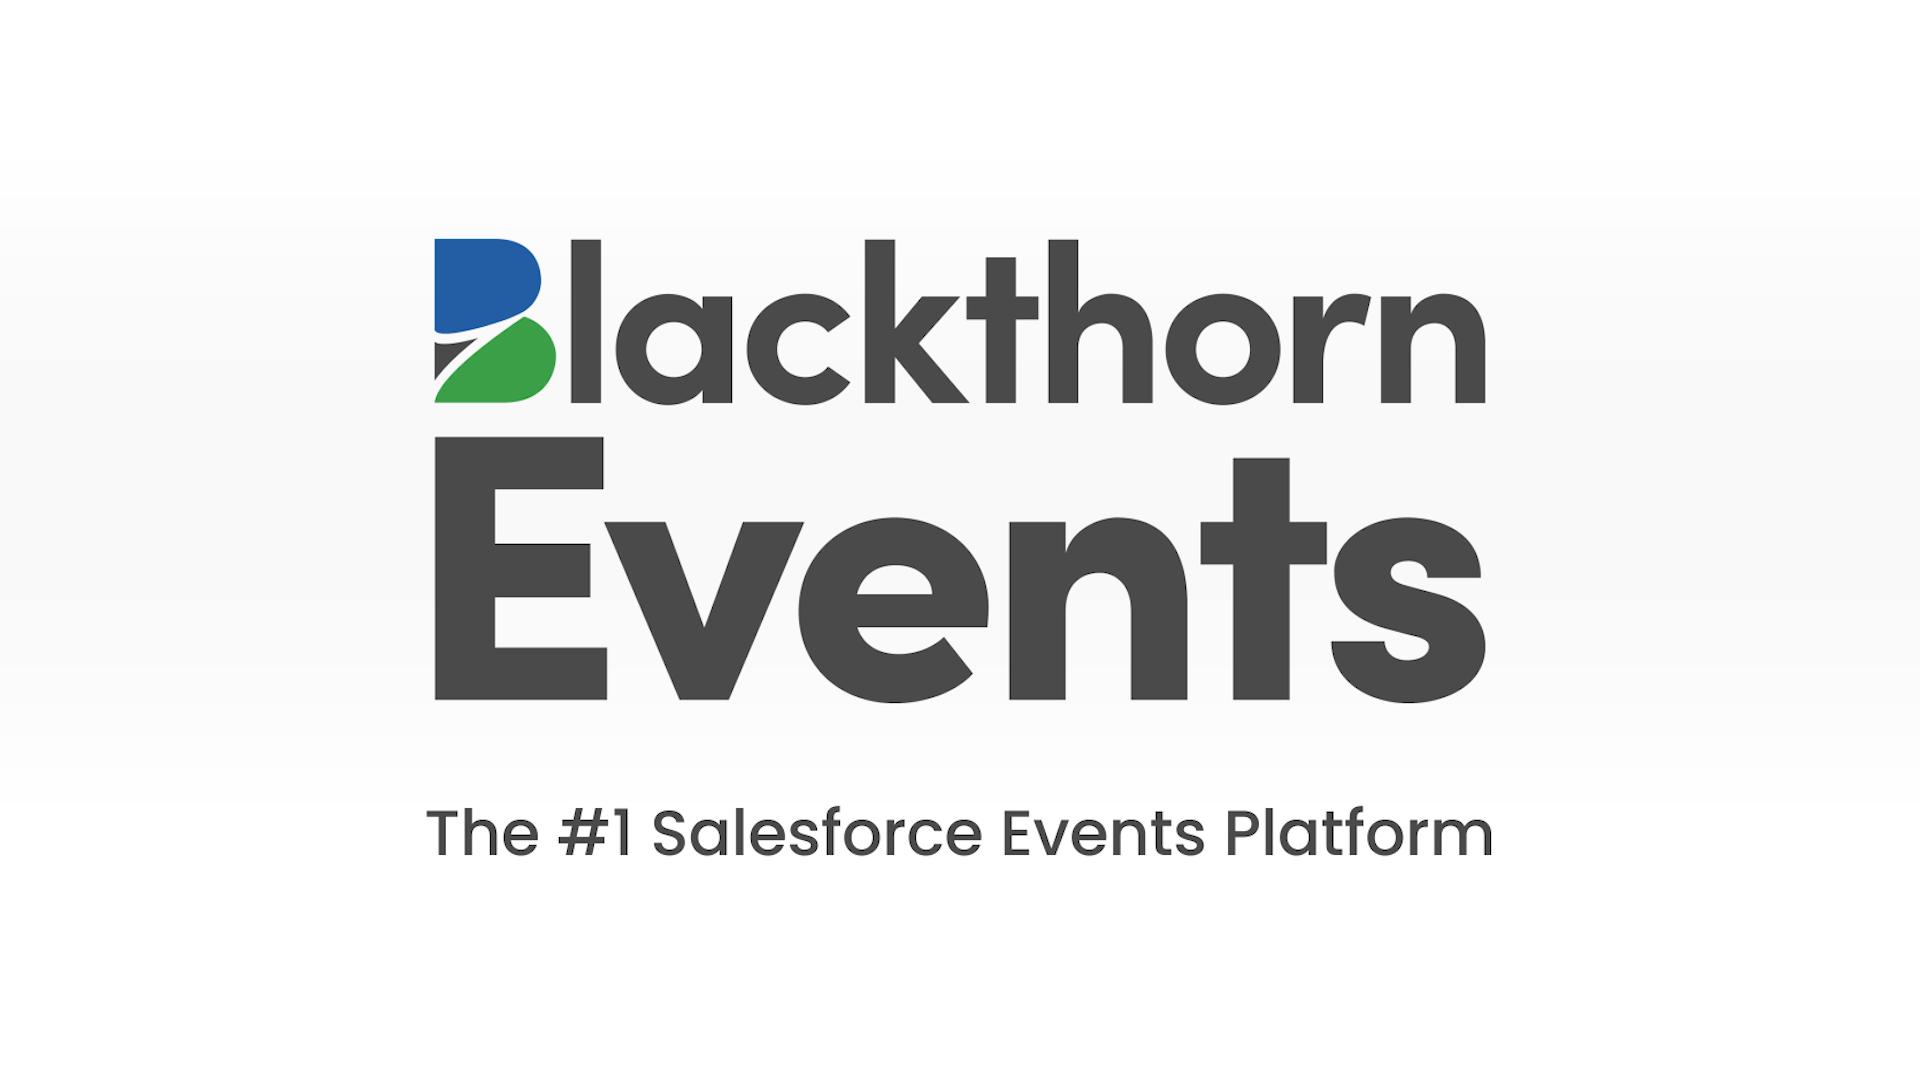 The #1 Salesforce Events Platform